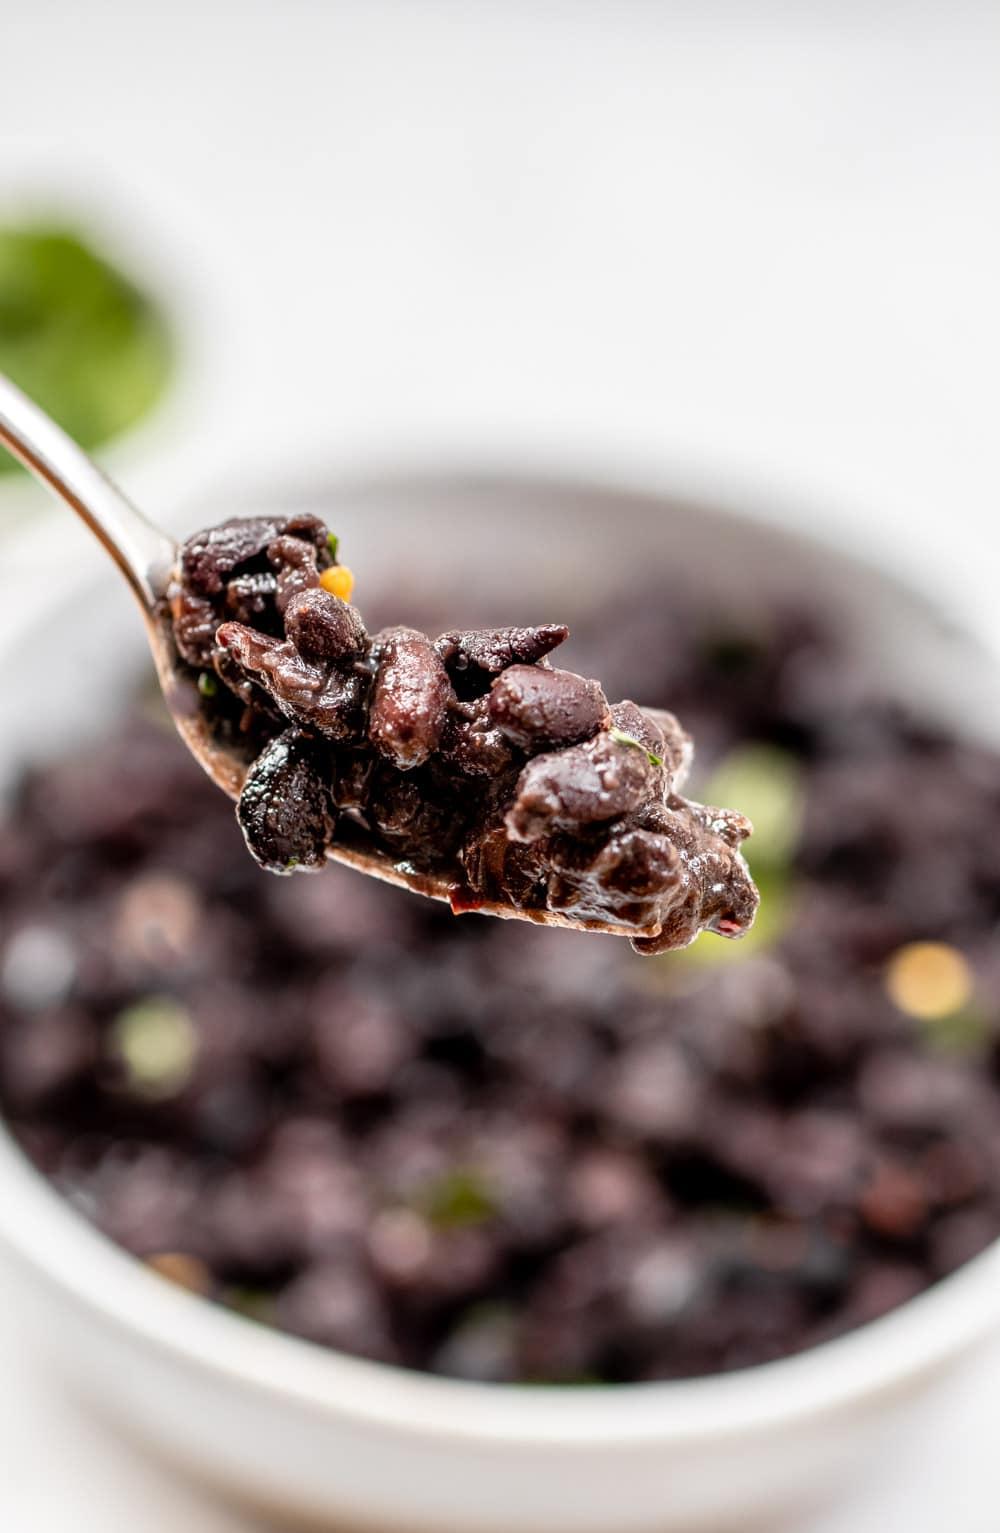 Instant pot black beans on a fork.